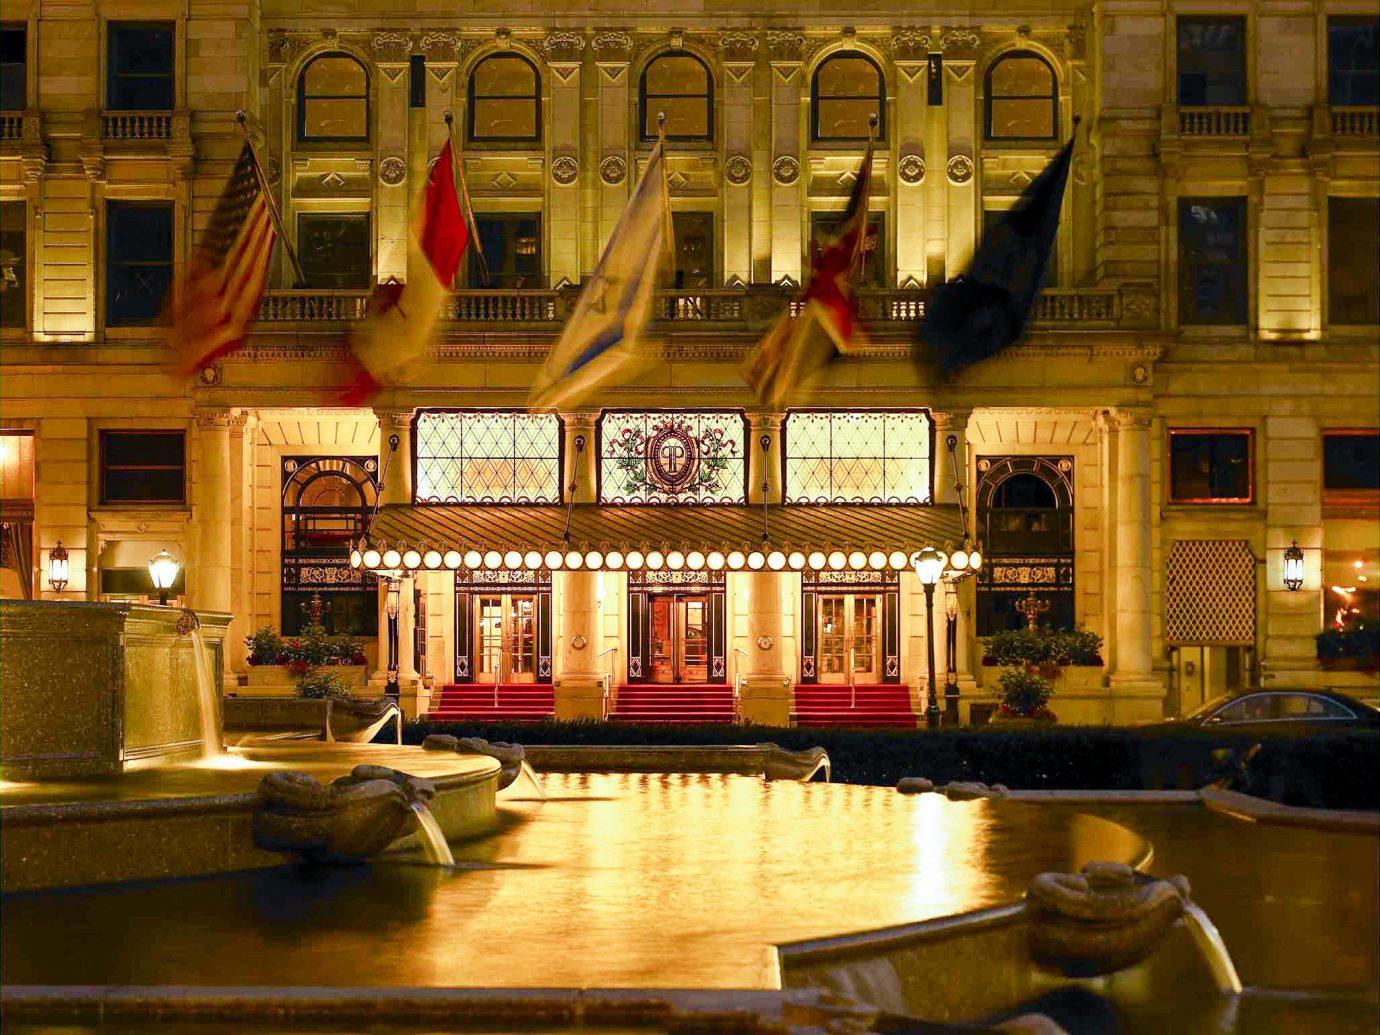 Hotels Luxury Travel Romantic Hotels lighting interior design wood night Lobby several